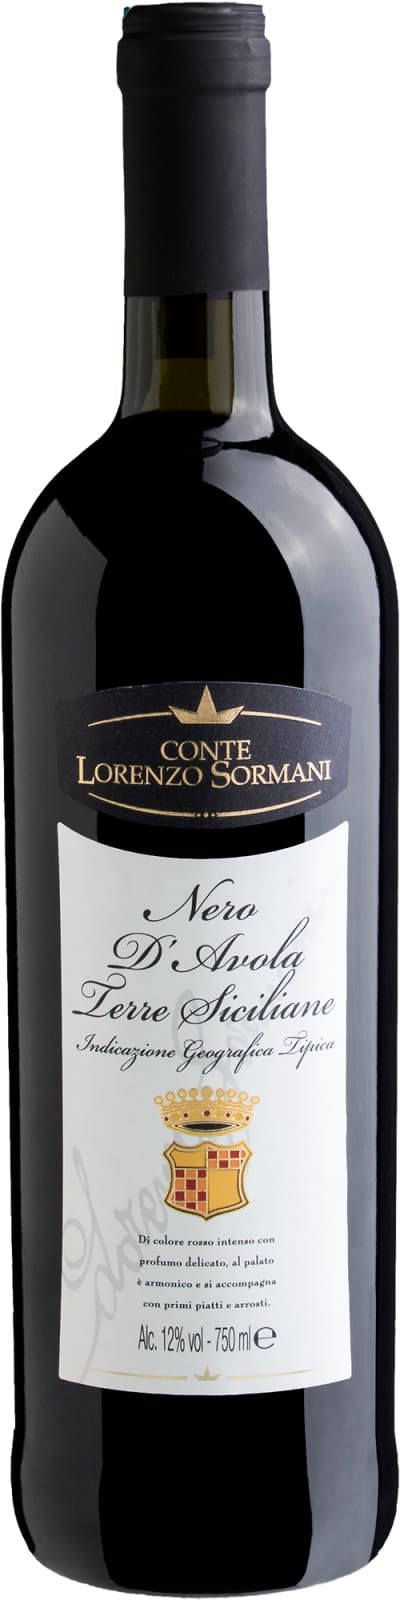 Conte Lorenzo Sormani Nero d'Avola